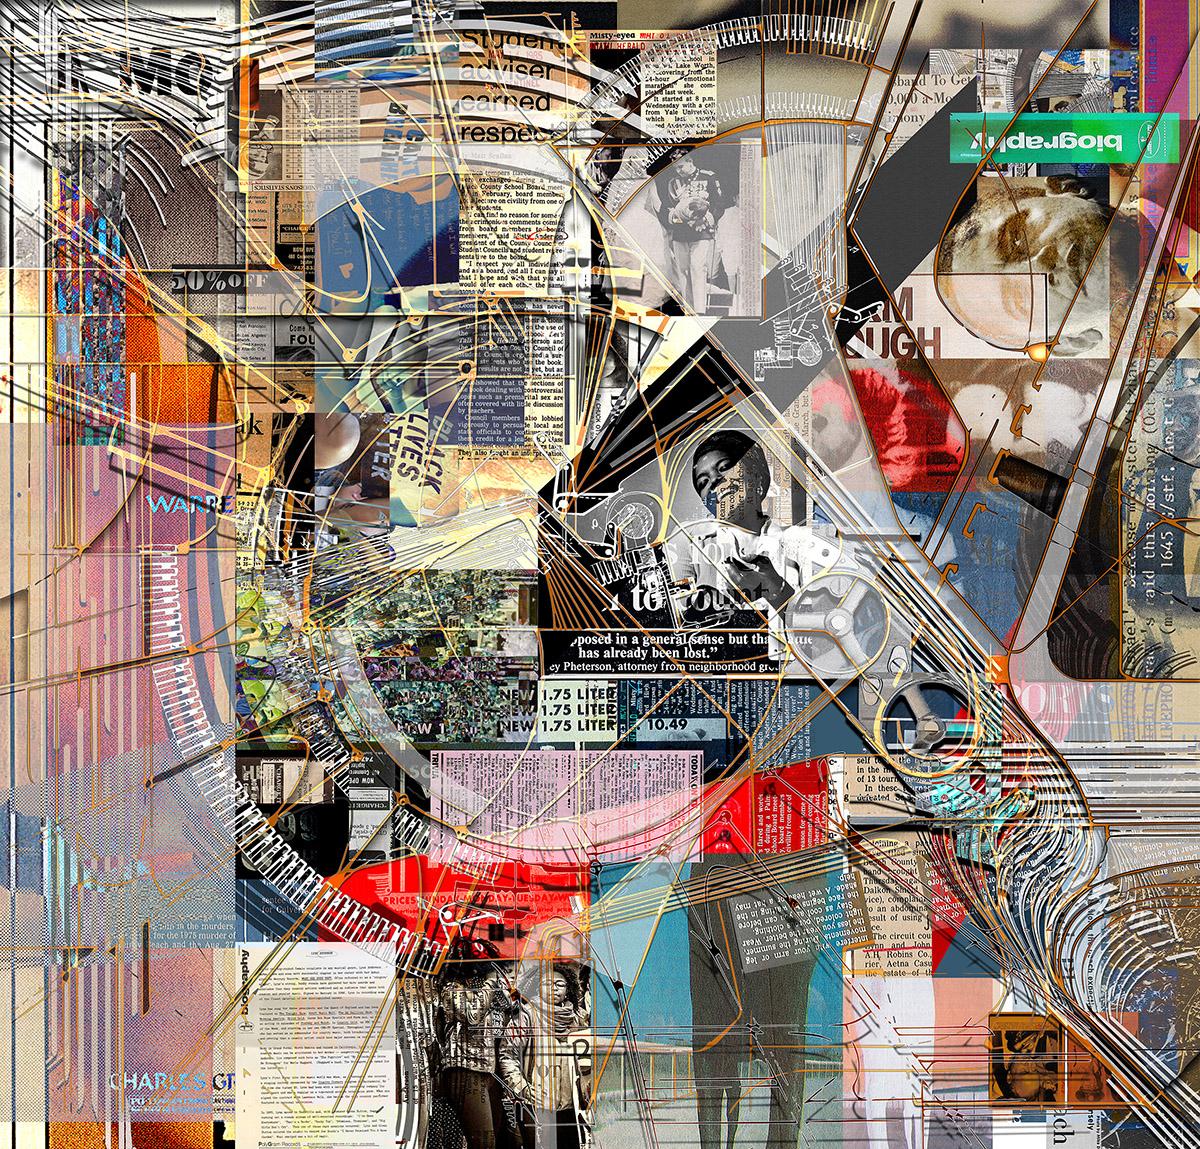 Art Installation The Press